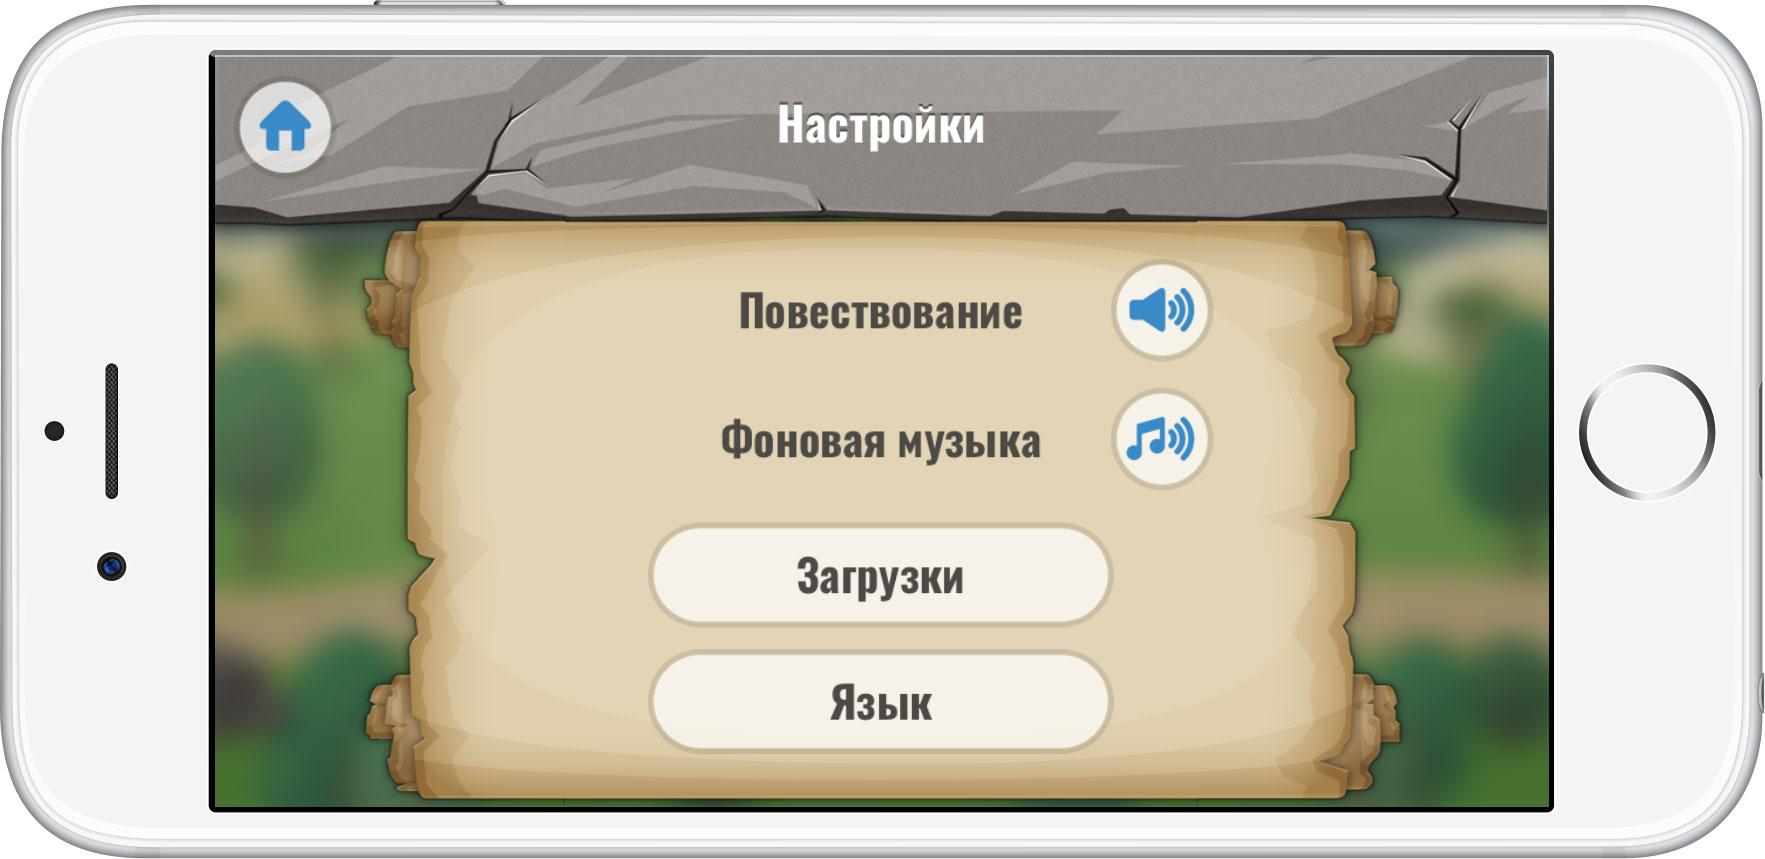 Приложение на андроид смайлики на фото